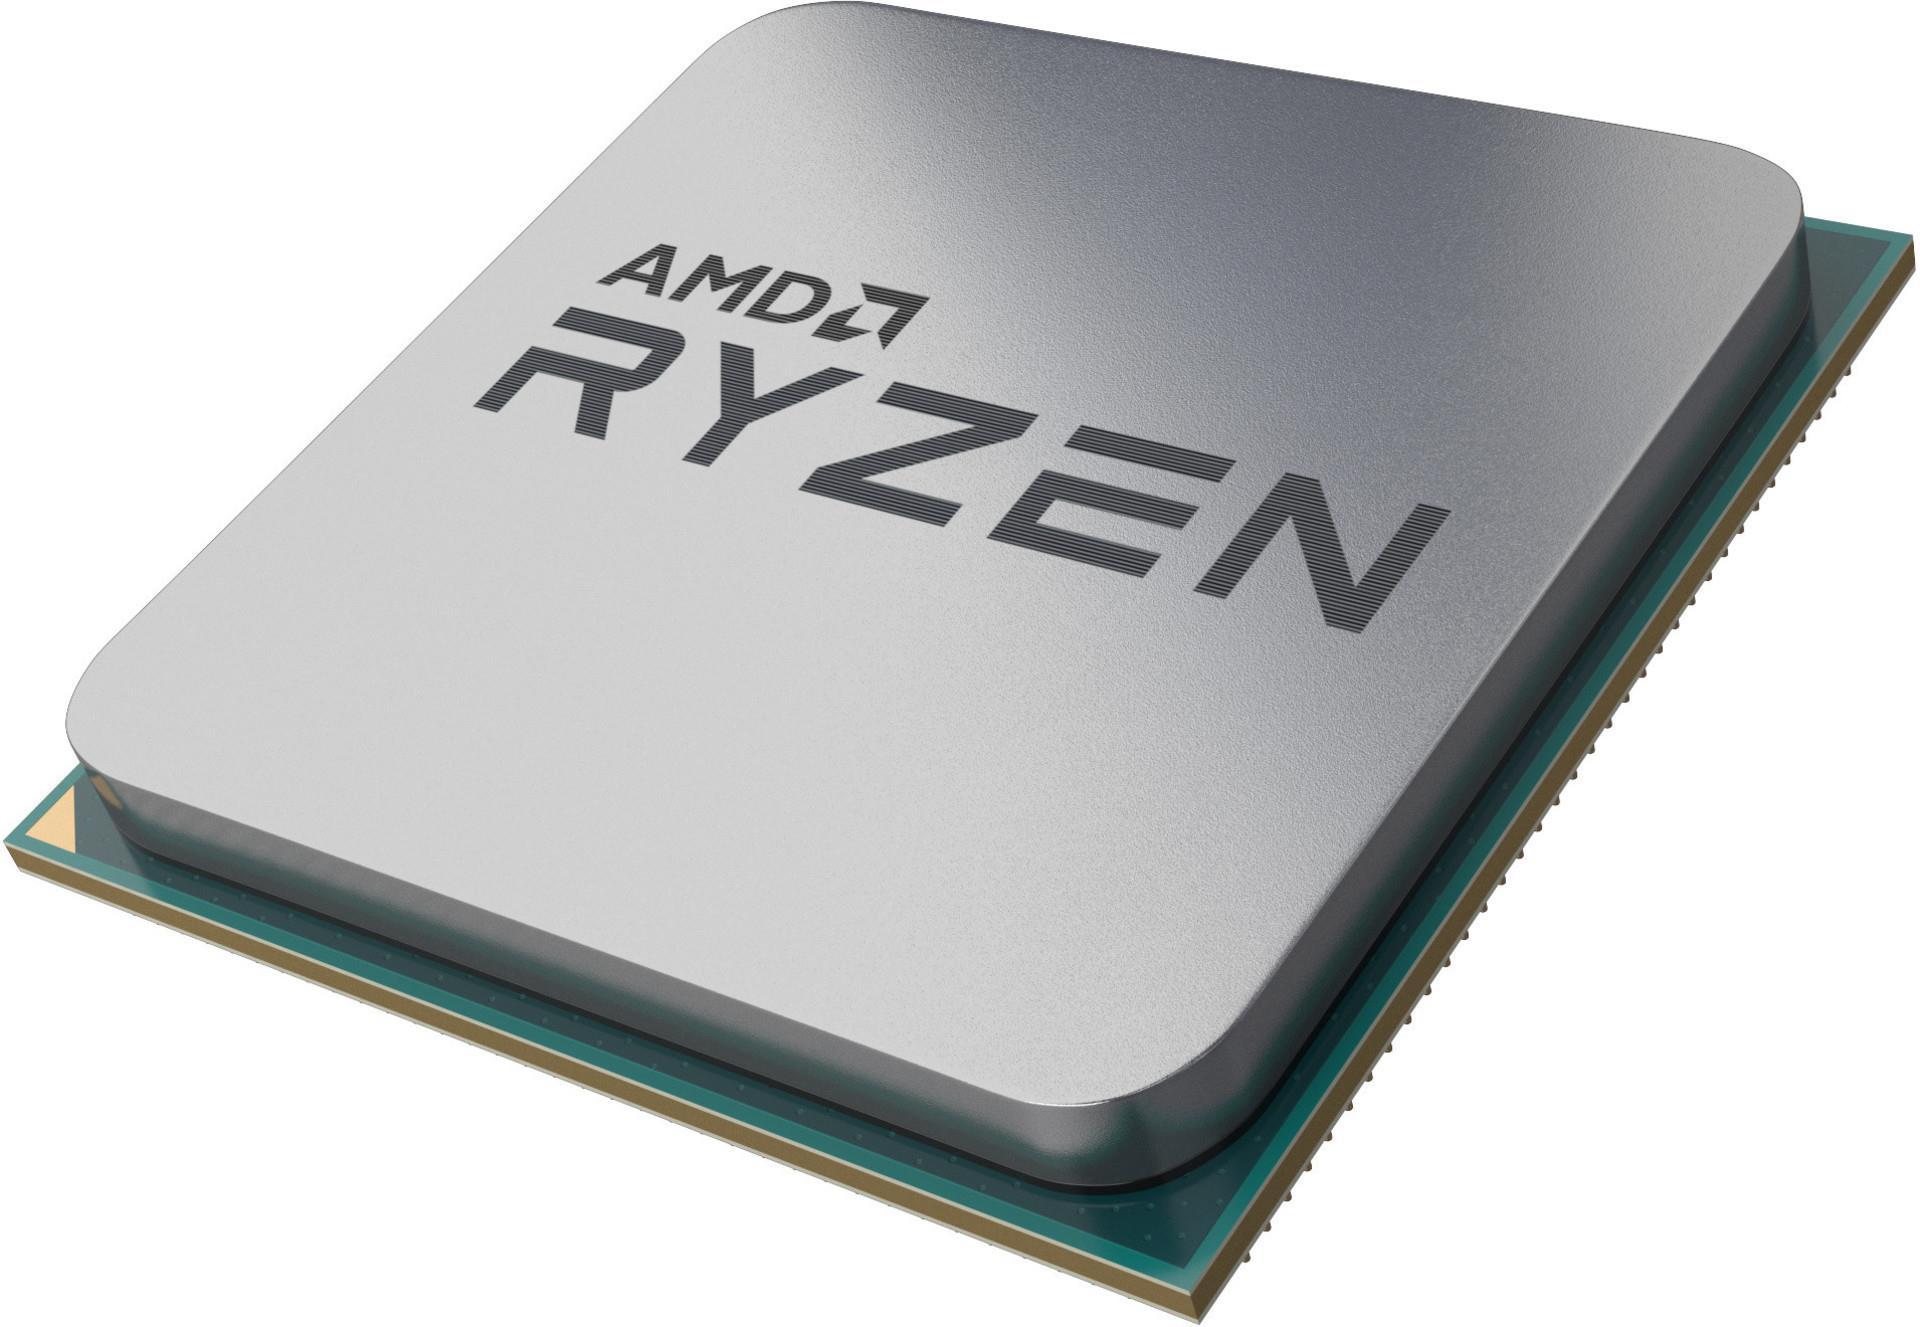 AMD Ryzen 7 2700X (3.7GHz) Processor 8 Core 16MB L3 Cache